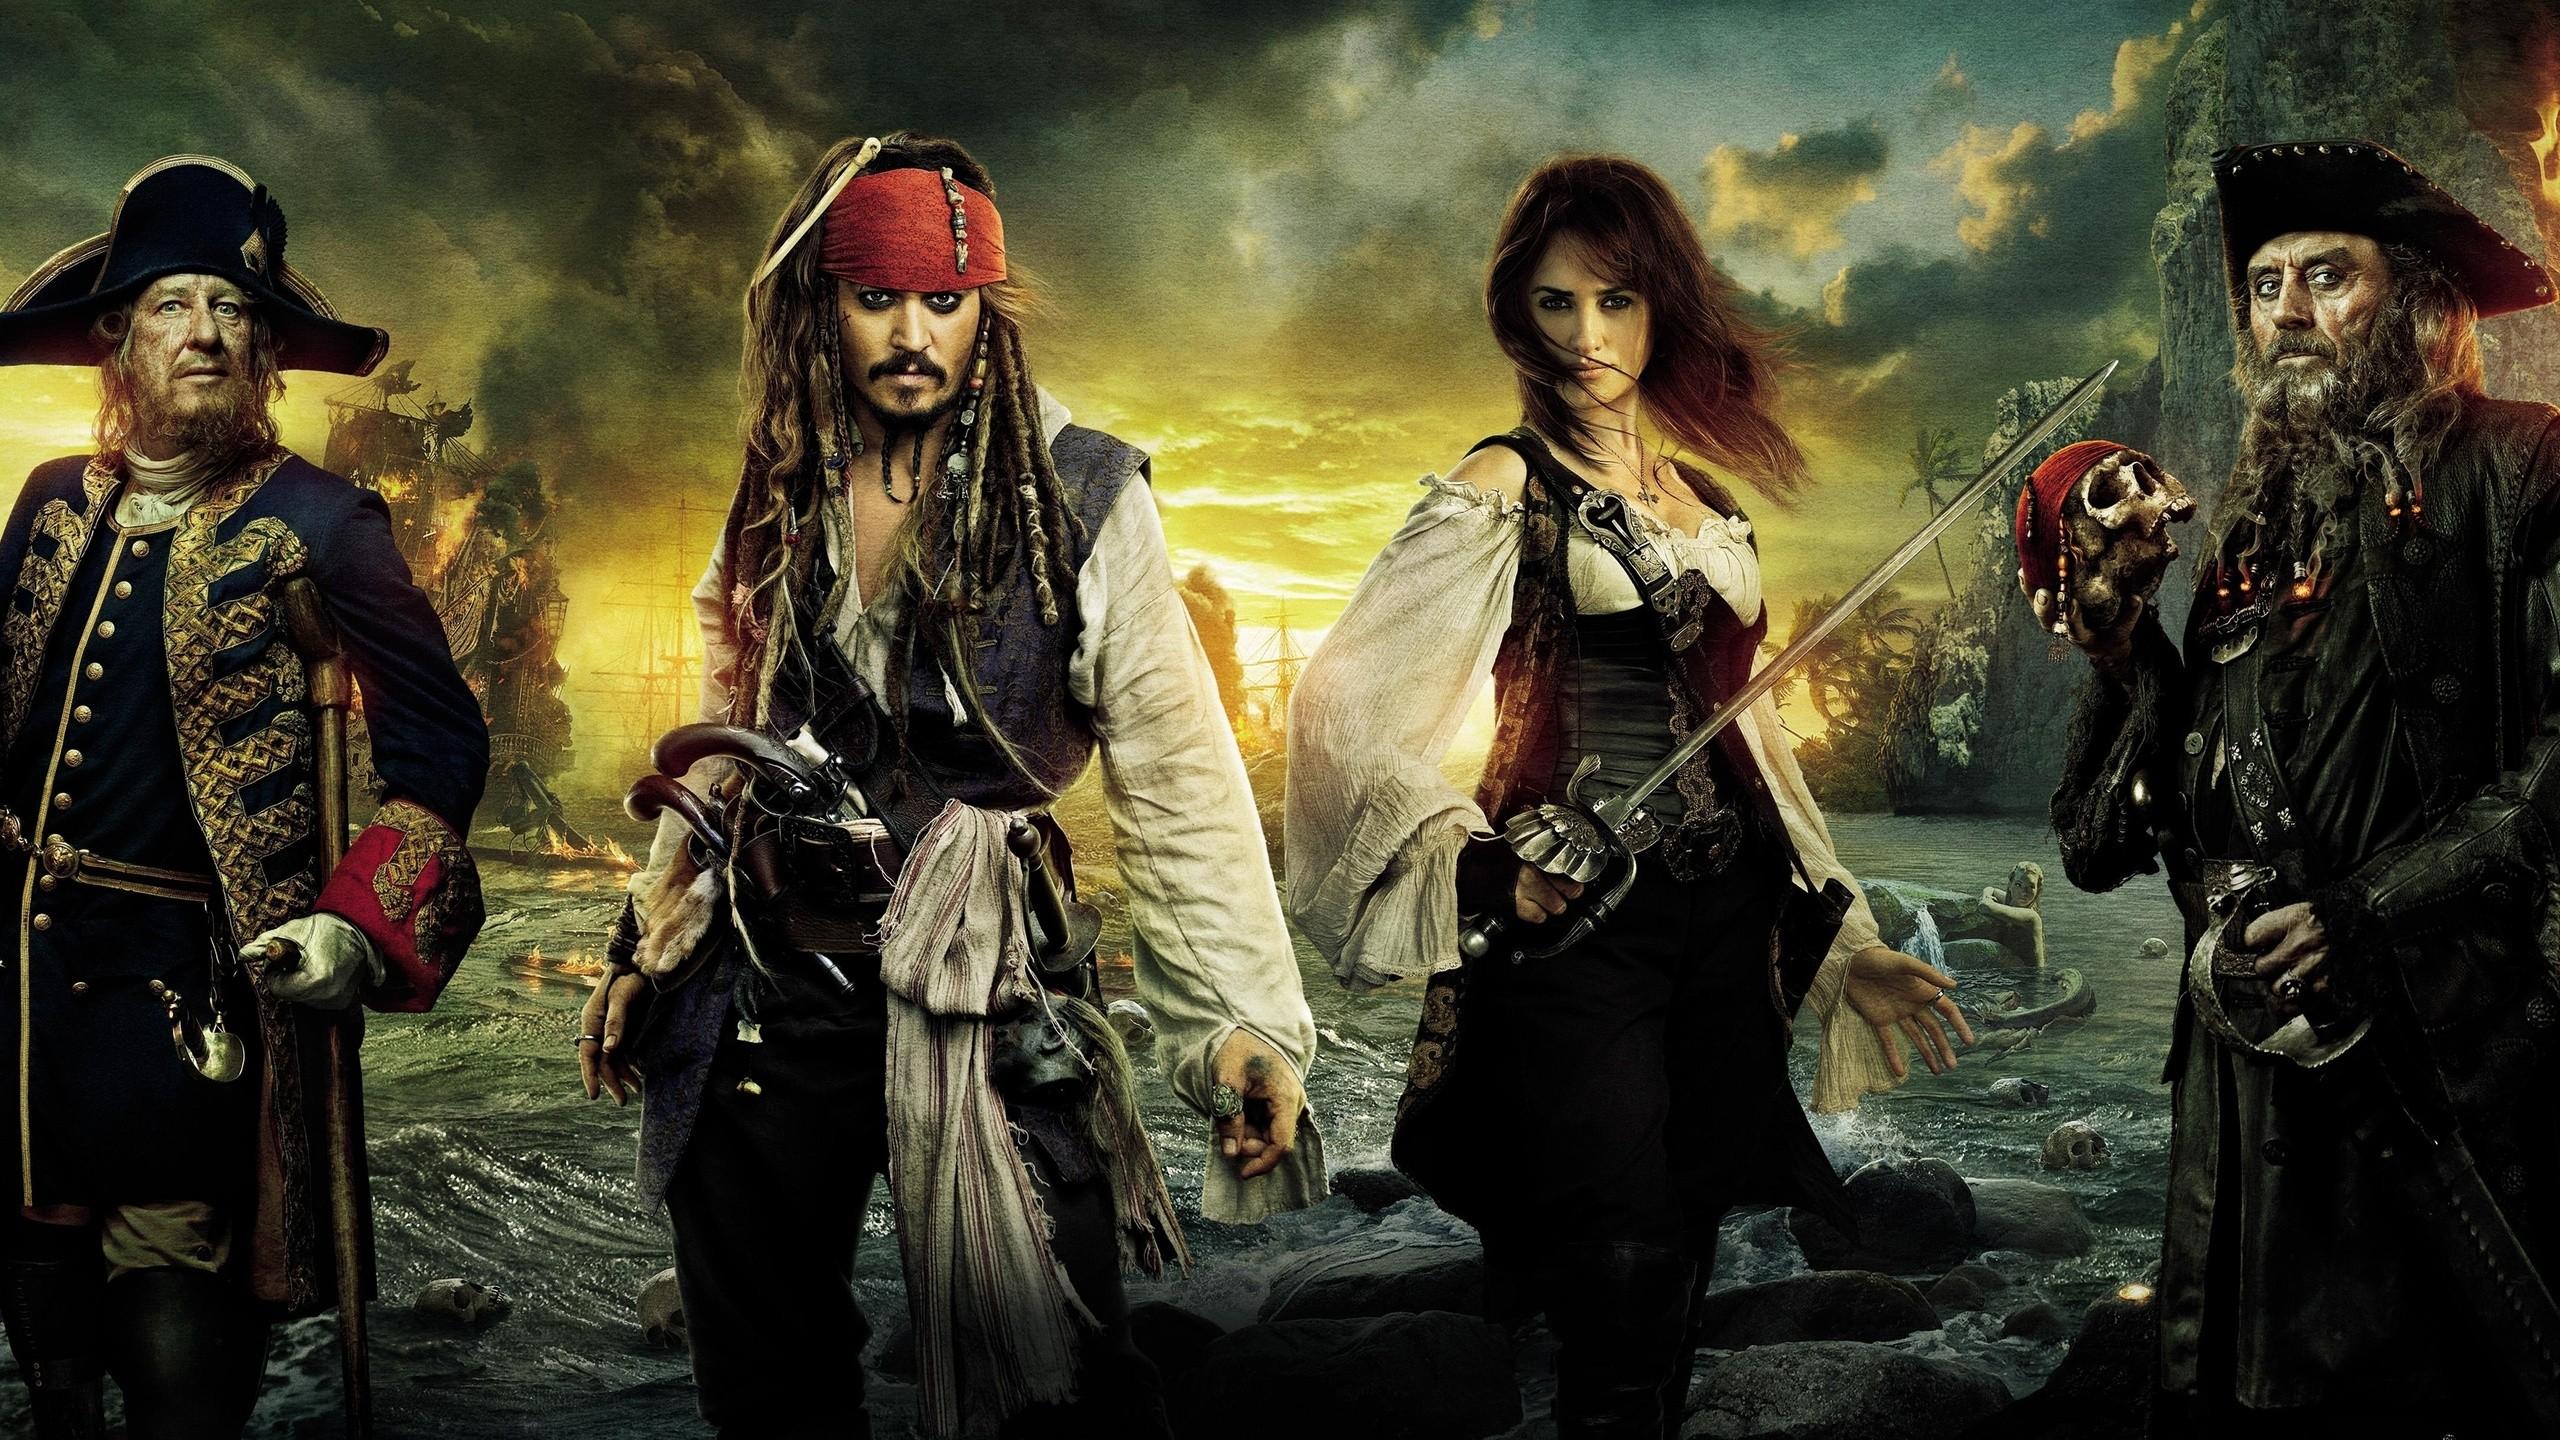 Wallpaper Movies Mythology Johnny Depp Penelope Cruz